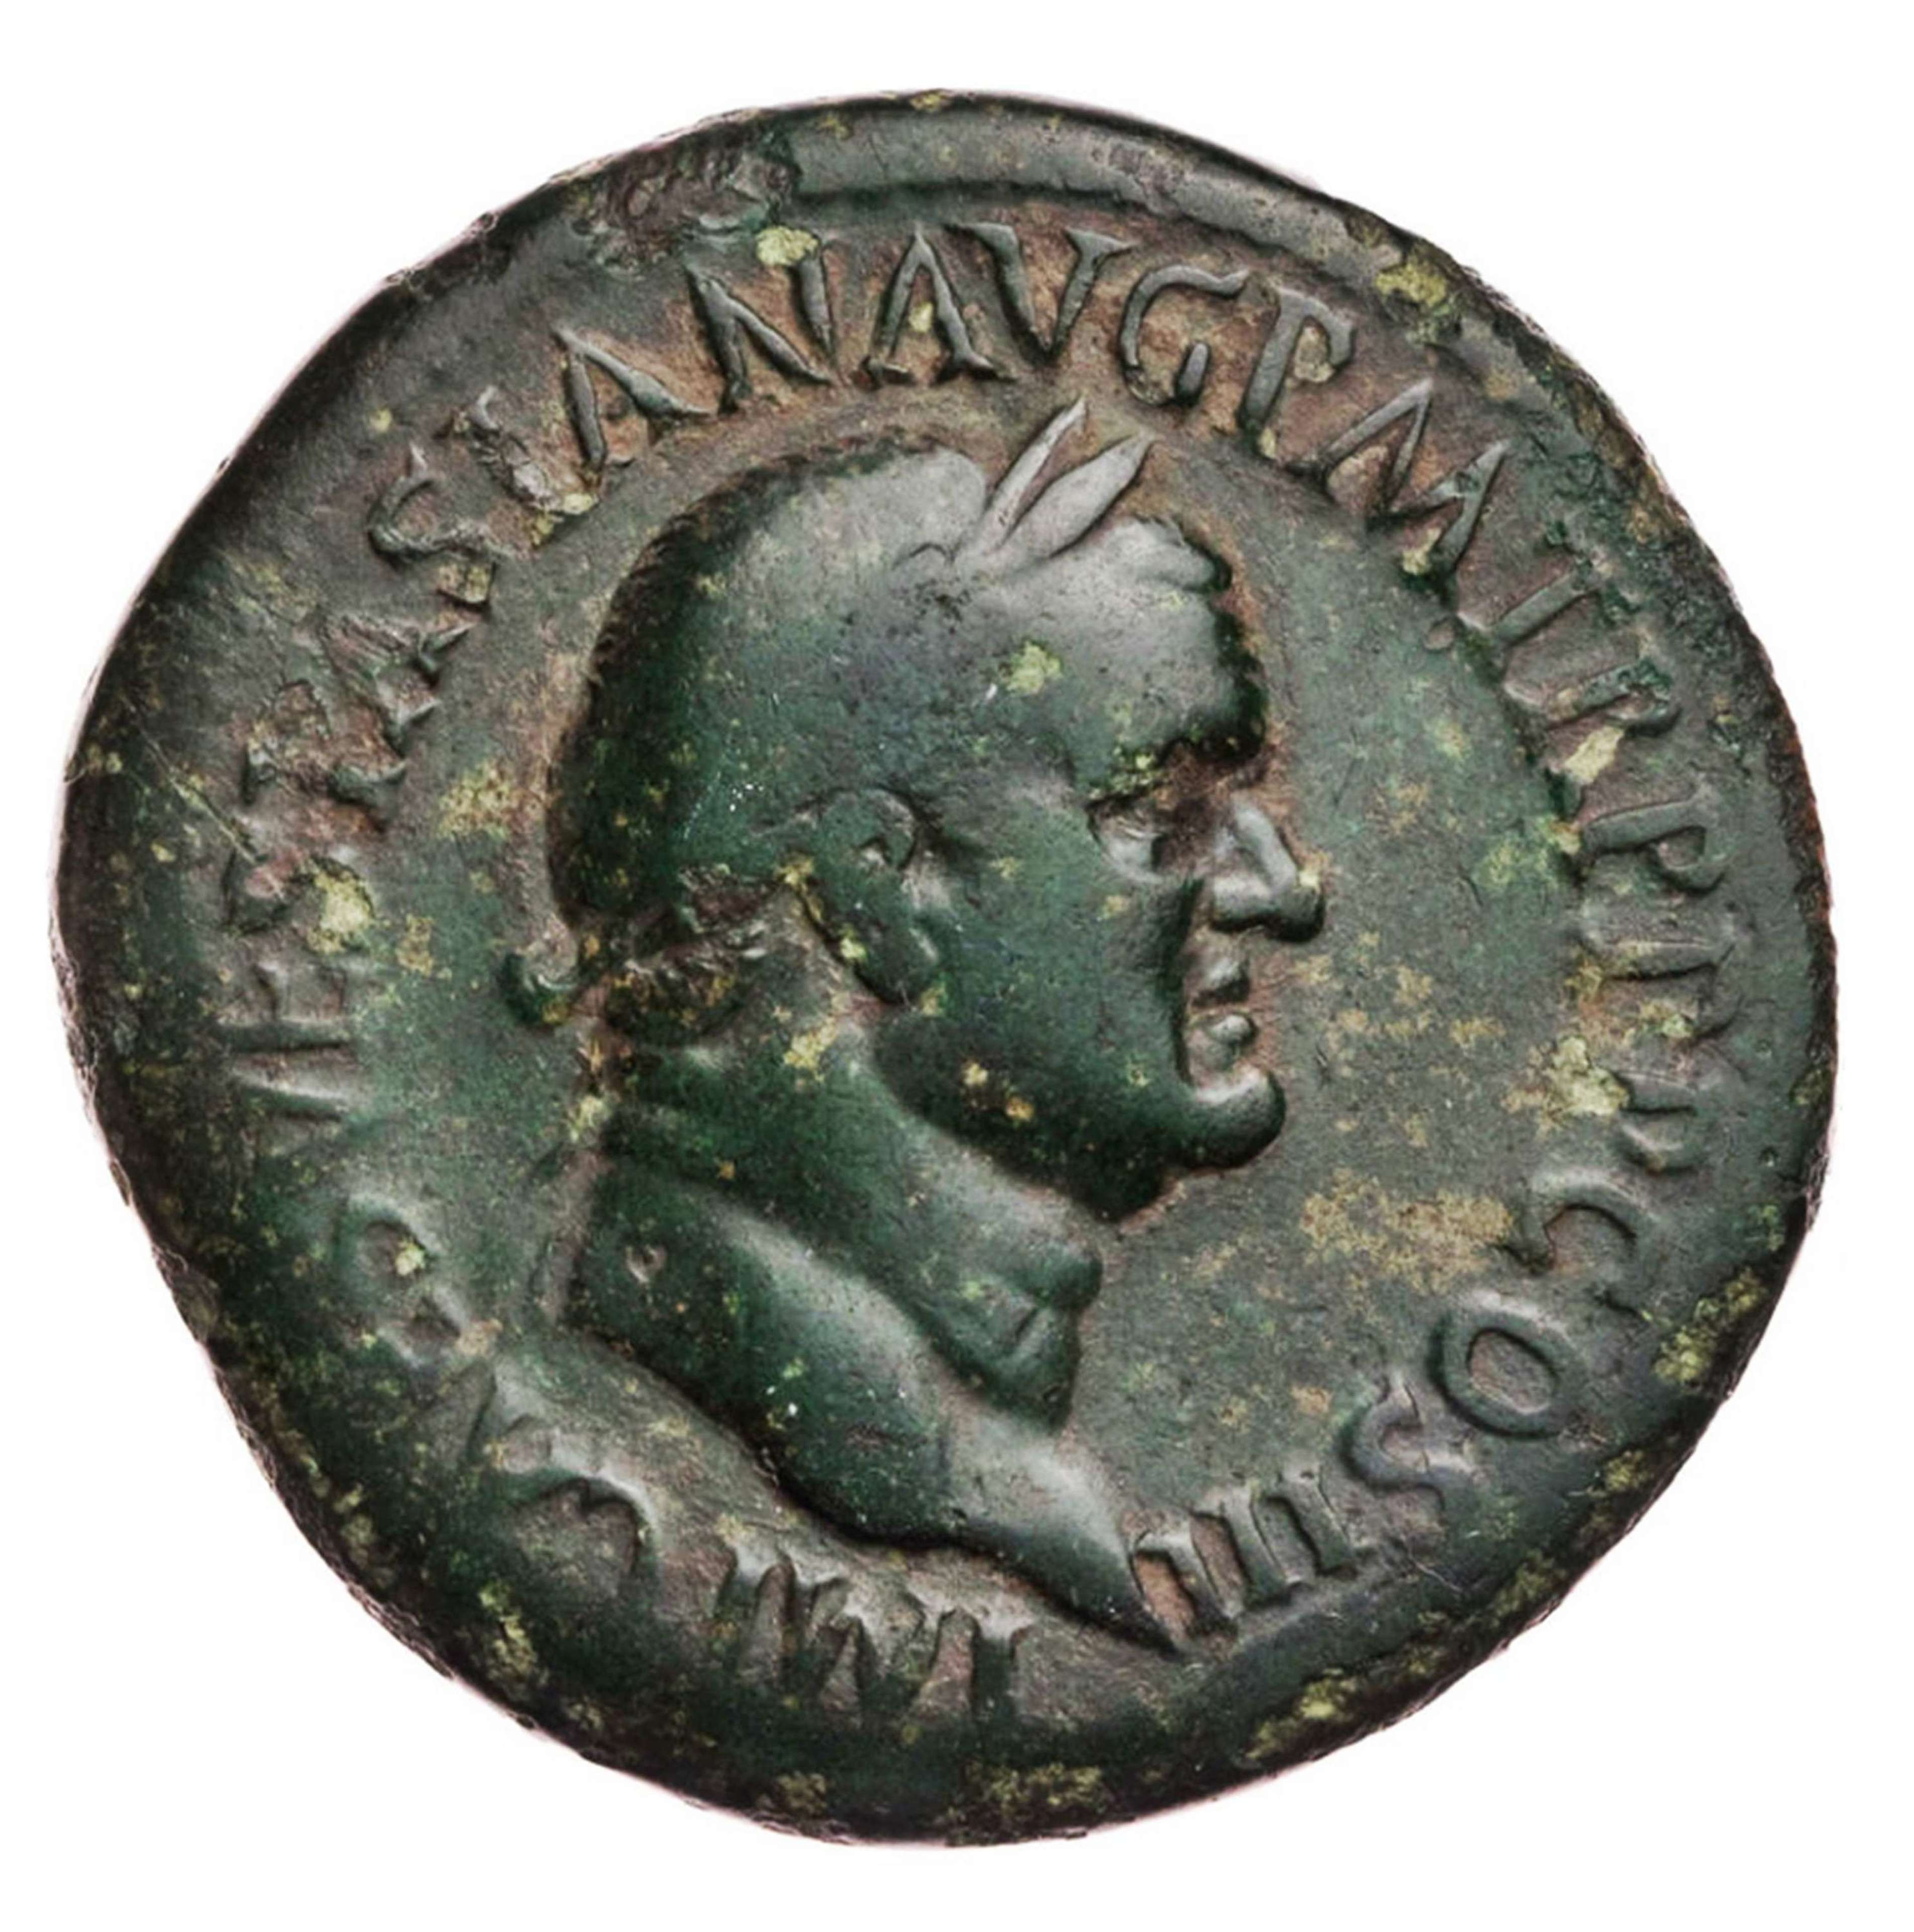 Ancient Roman AE Sestertius of Emperor Vespasian / Roma